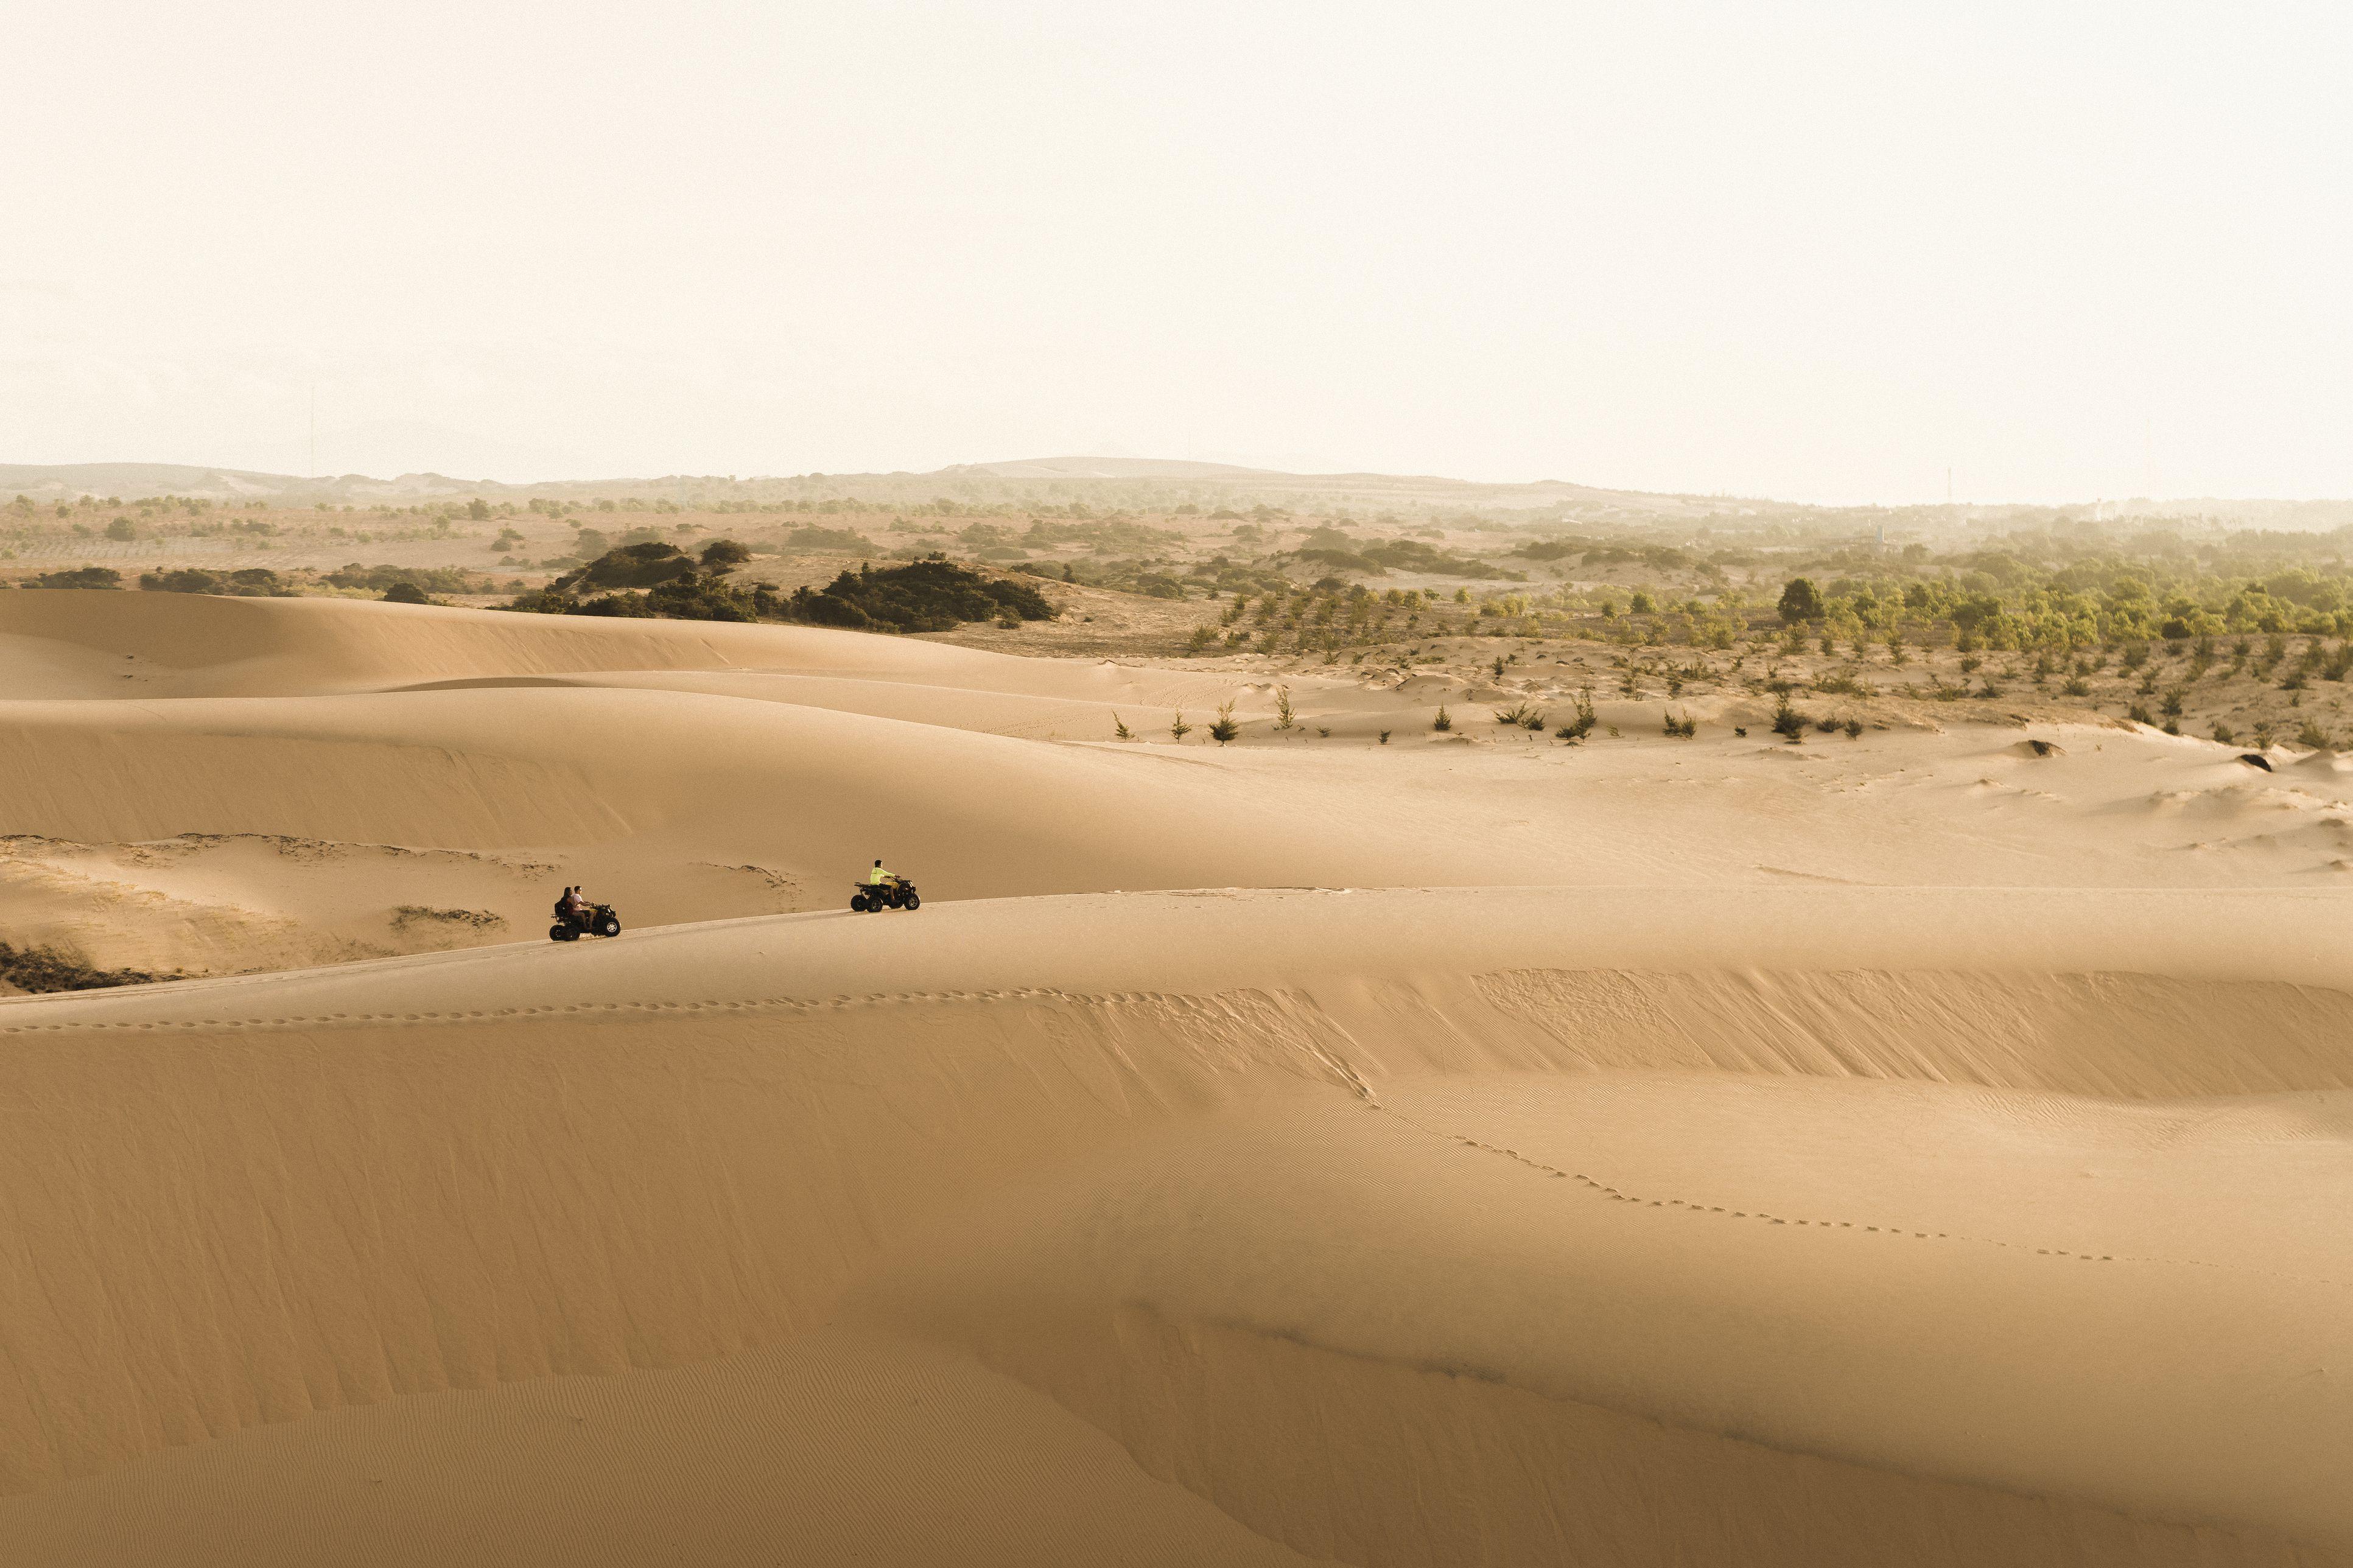 How To Get To The Mui Ne Sand Dunes